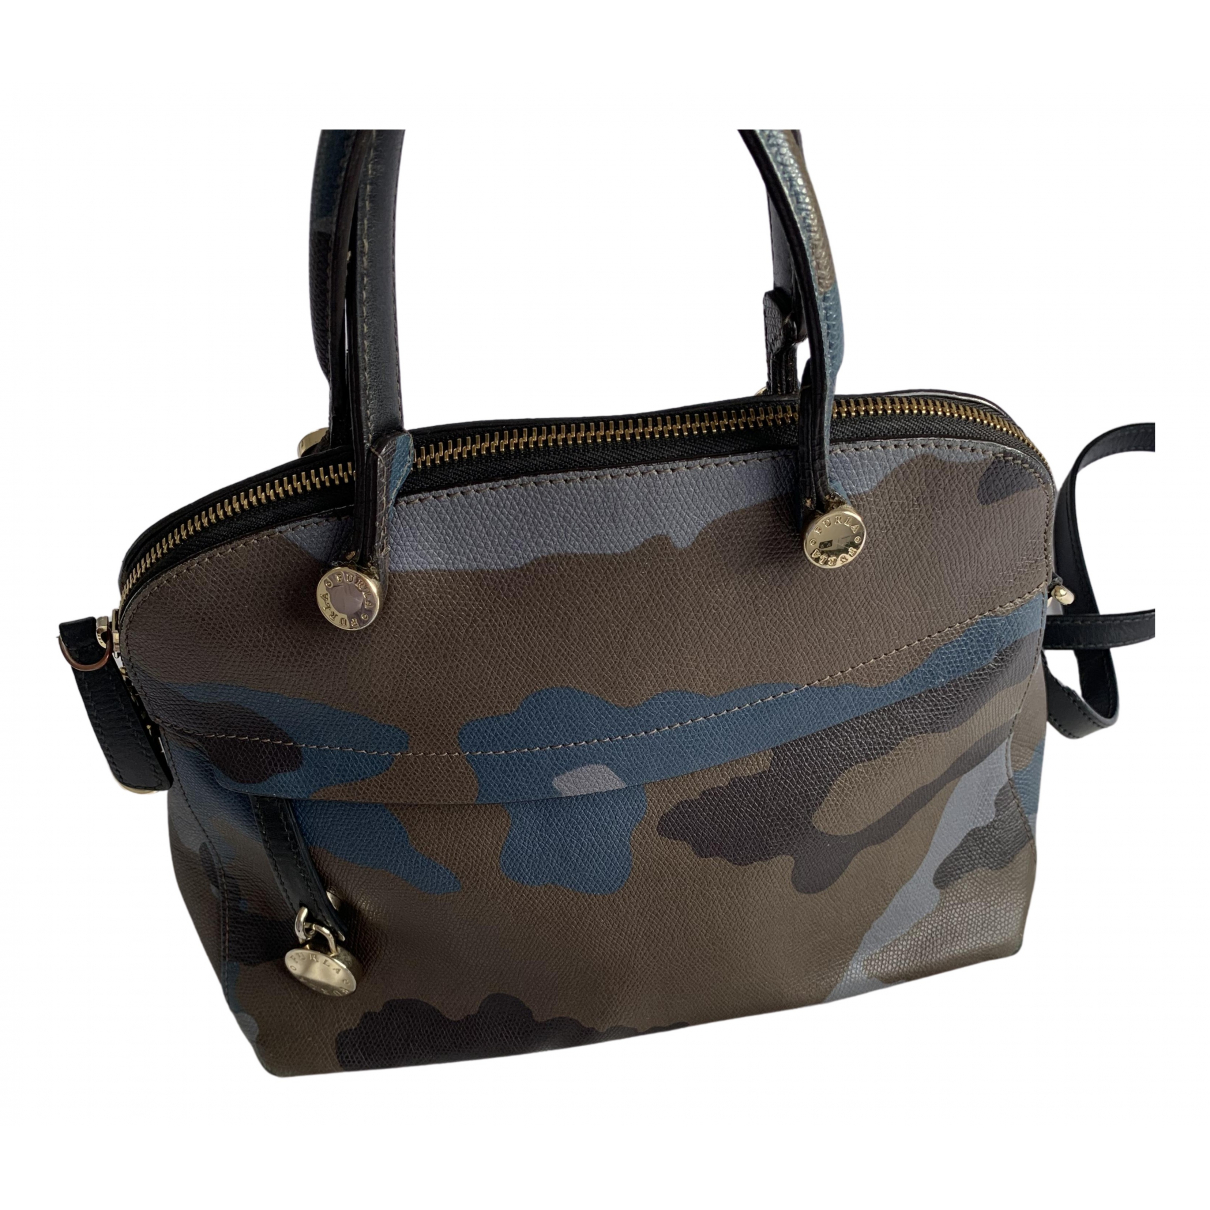 Furla N Leather handbag for Women N